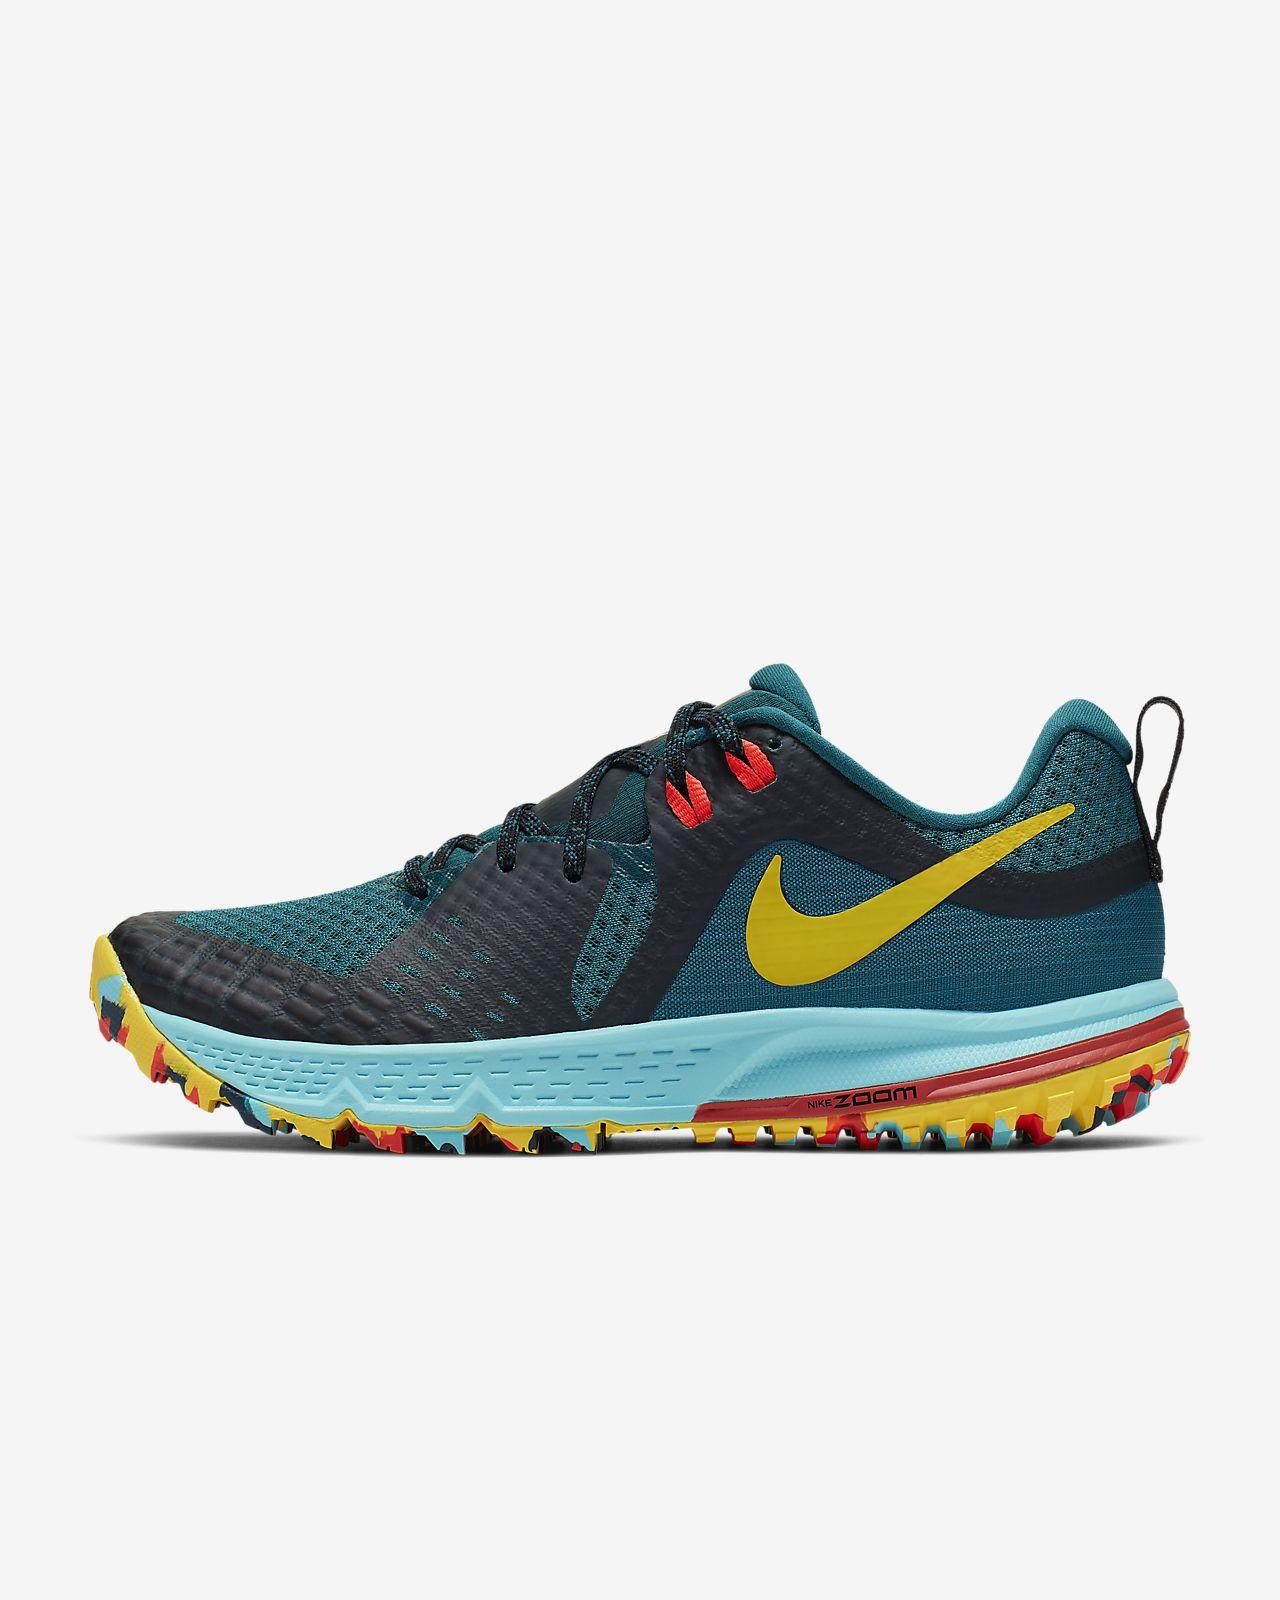 Nike Air Zoom Wildhorse 5 Hardloopschoen voor dames